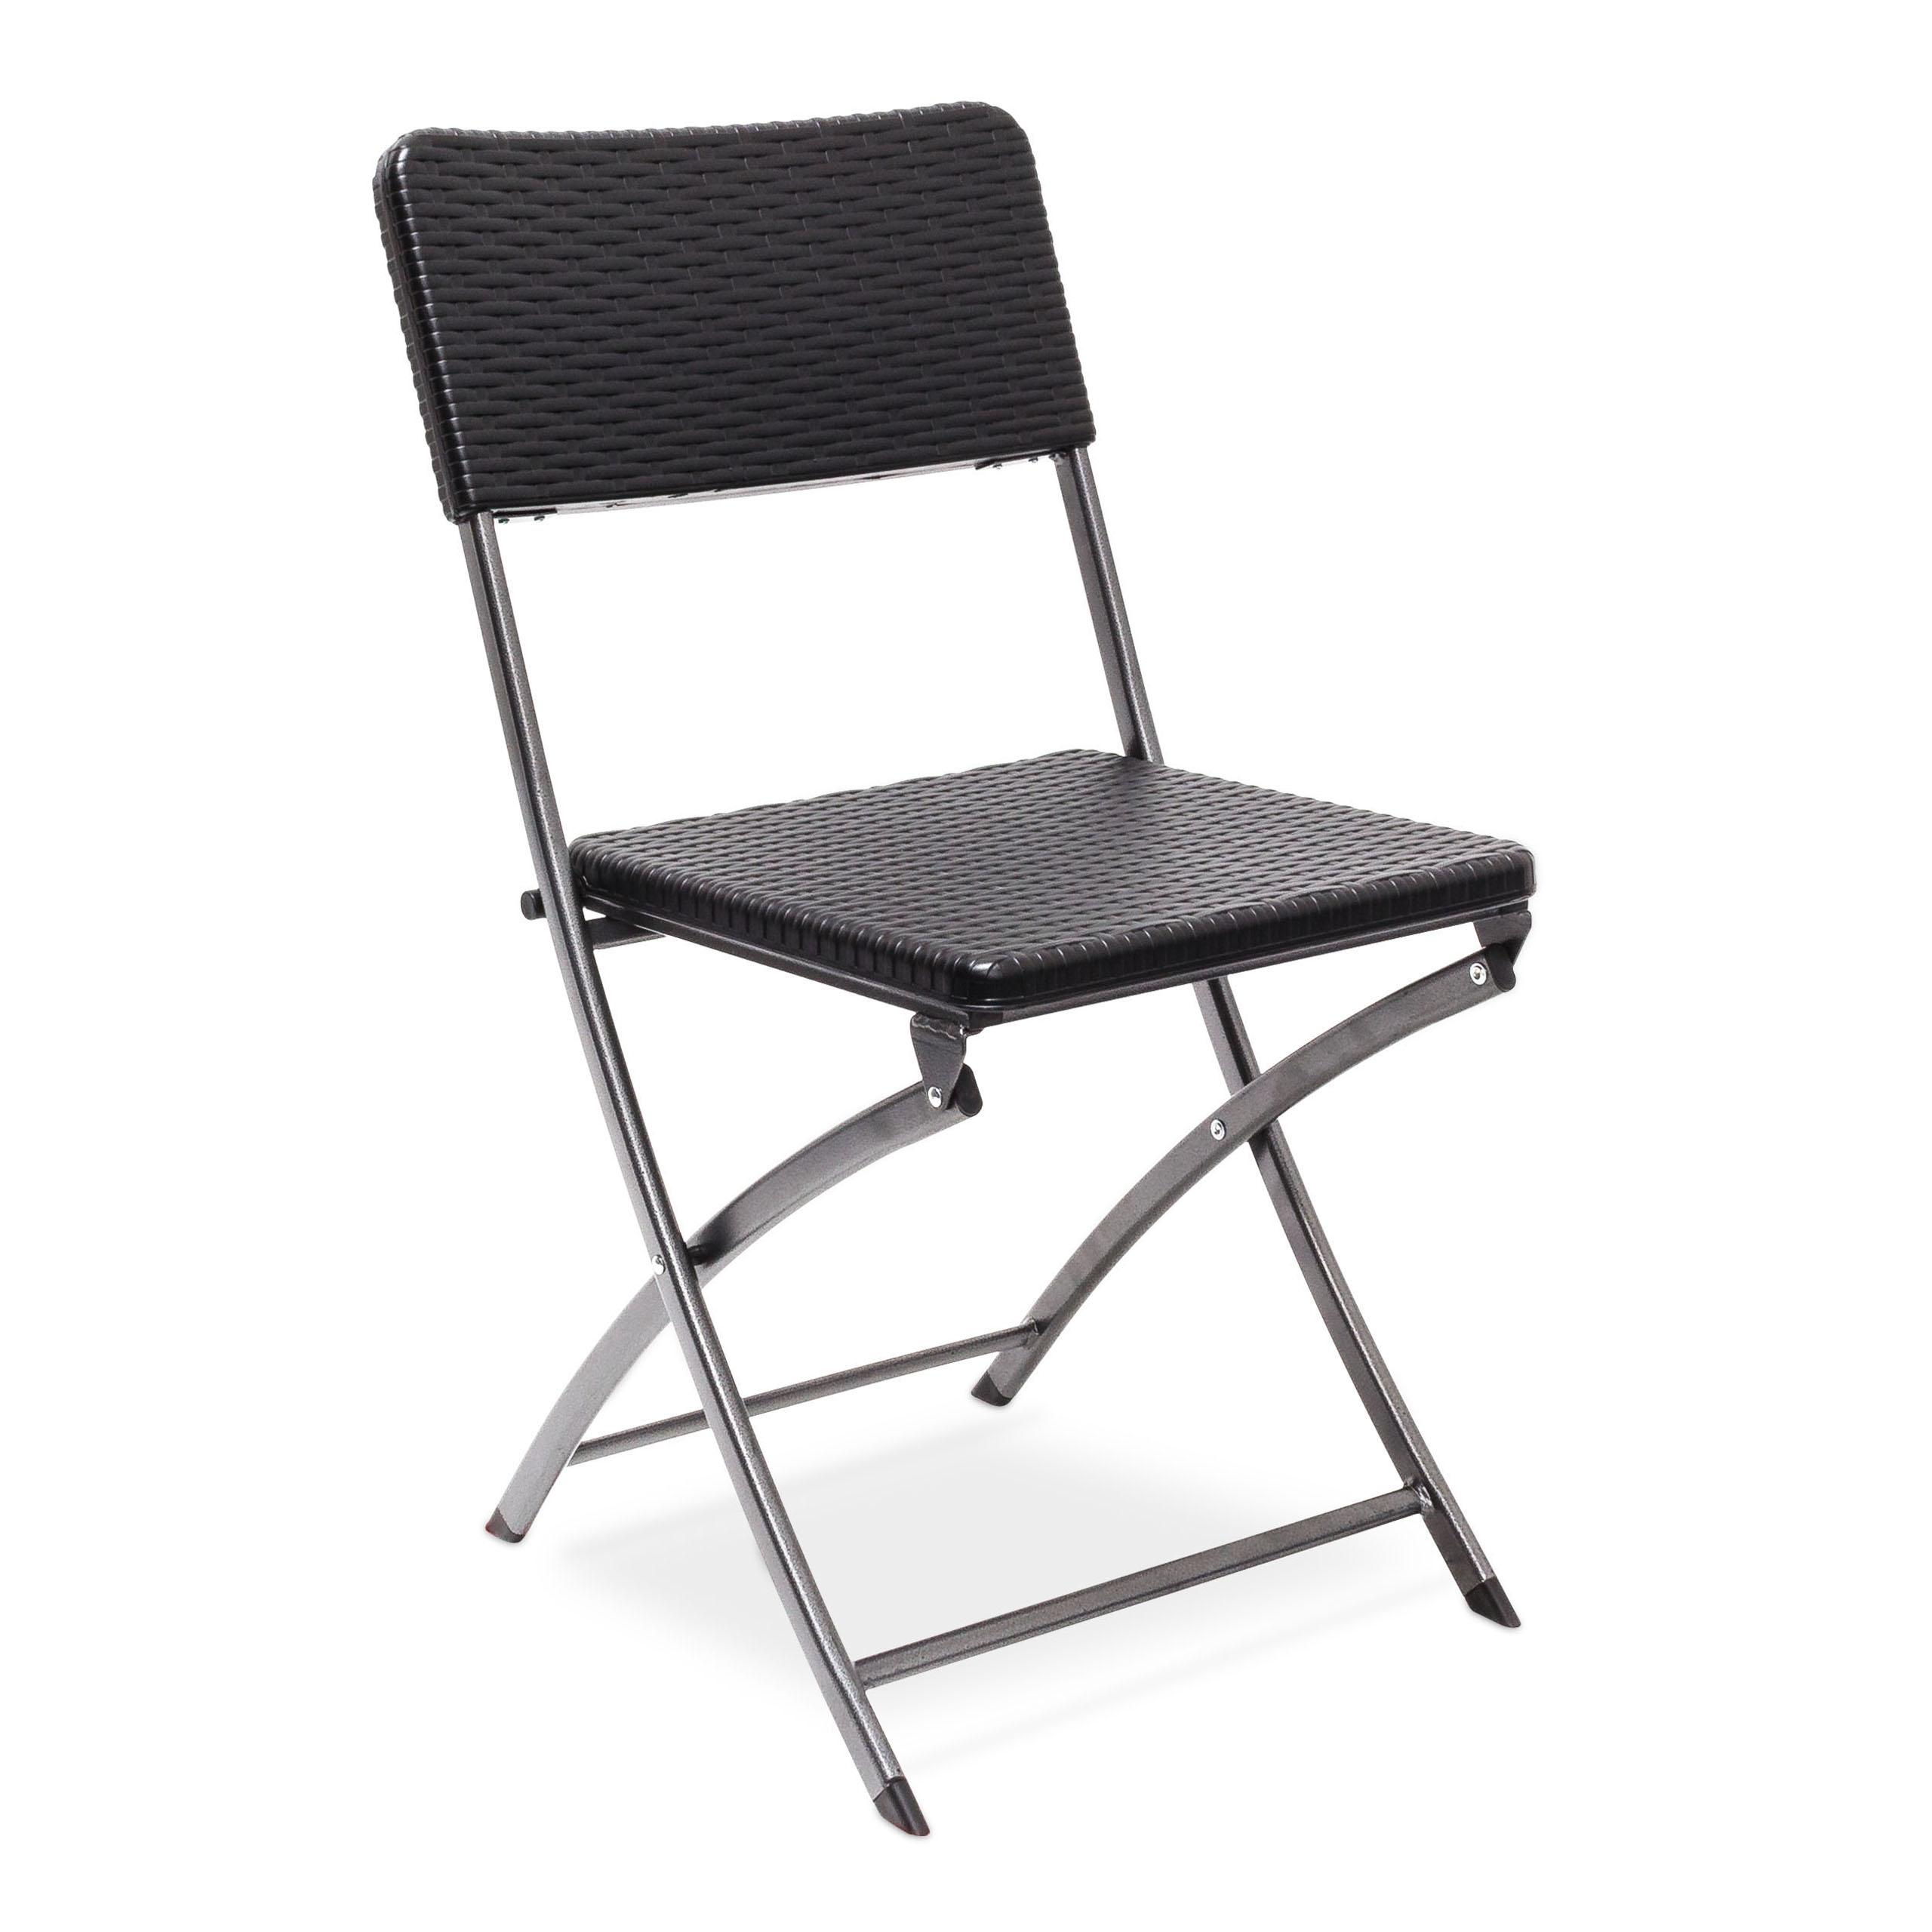 Chaise-de-jardin-pliable-pliante-Chaise-de-camping-BASTIAN-en-aspect-rotin